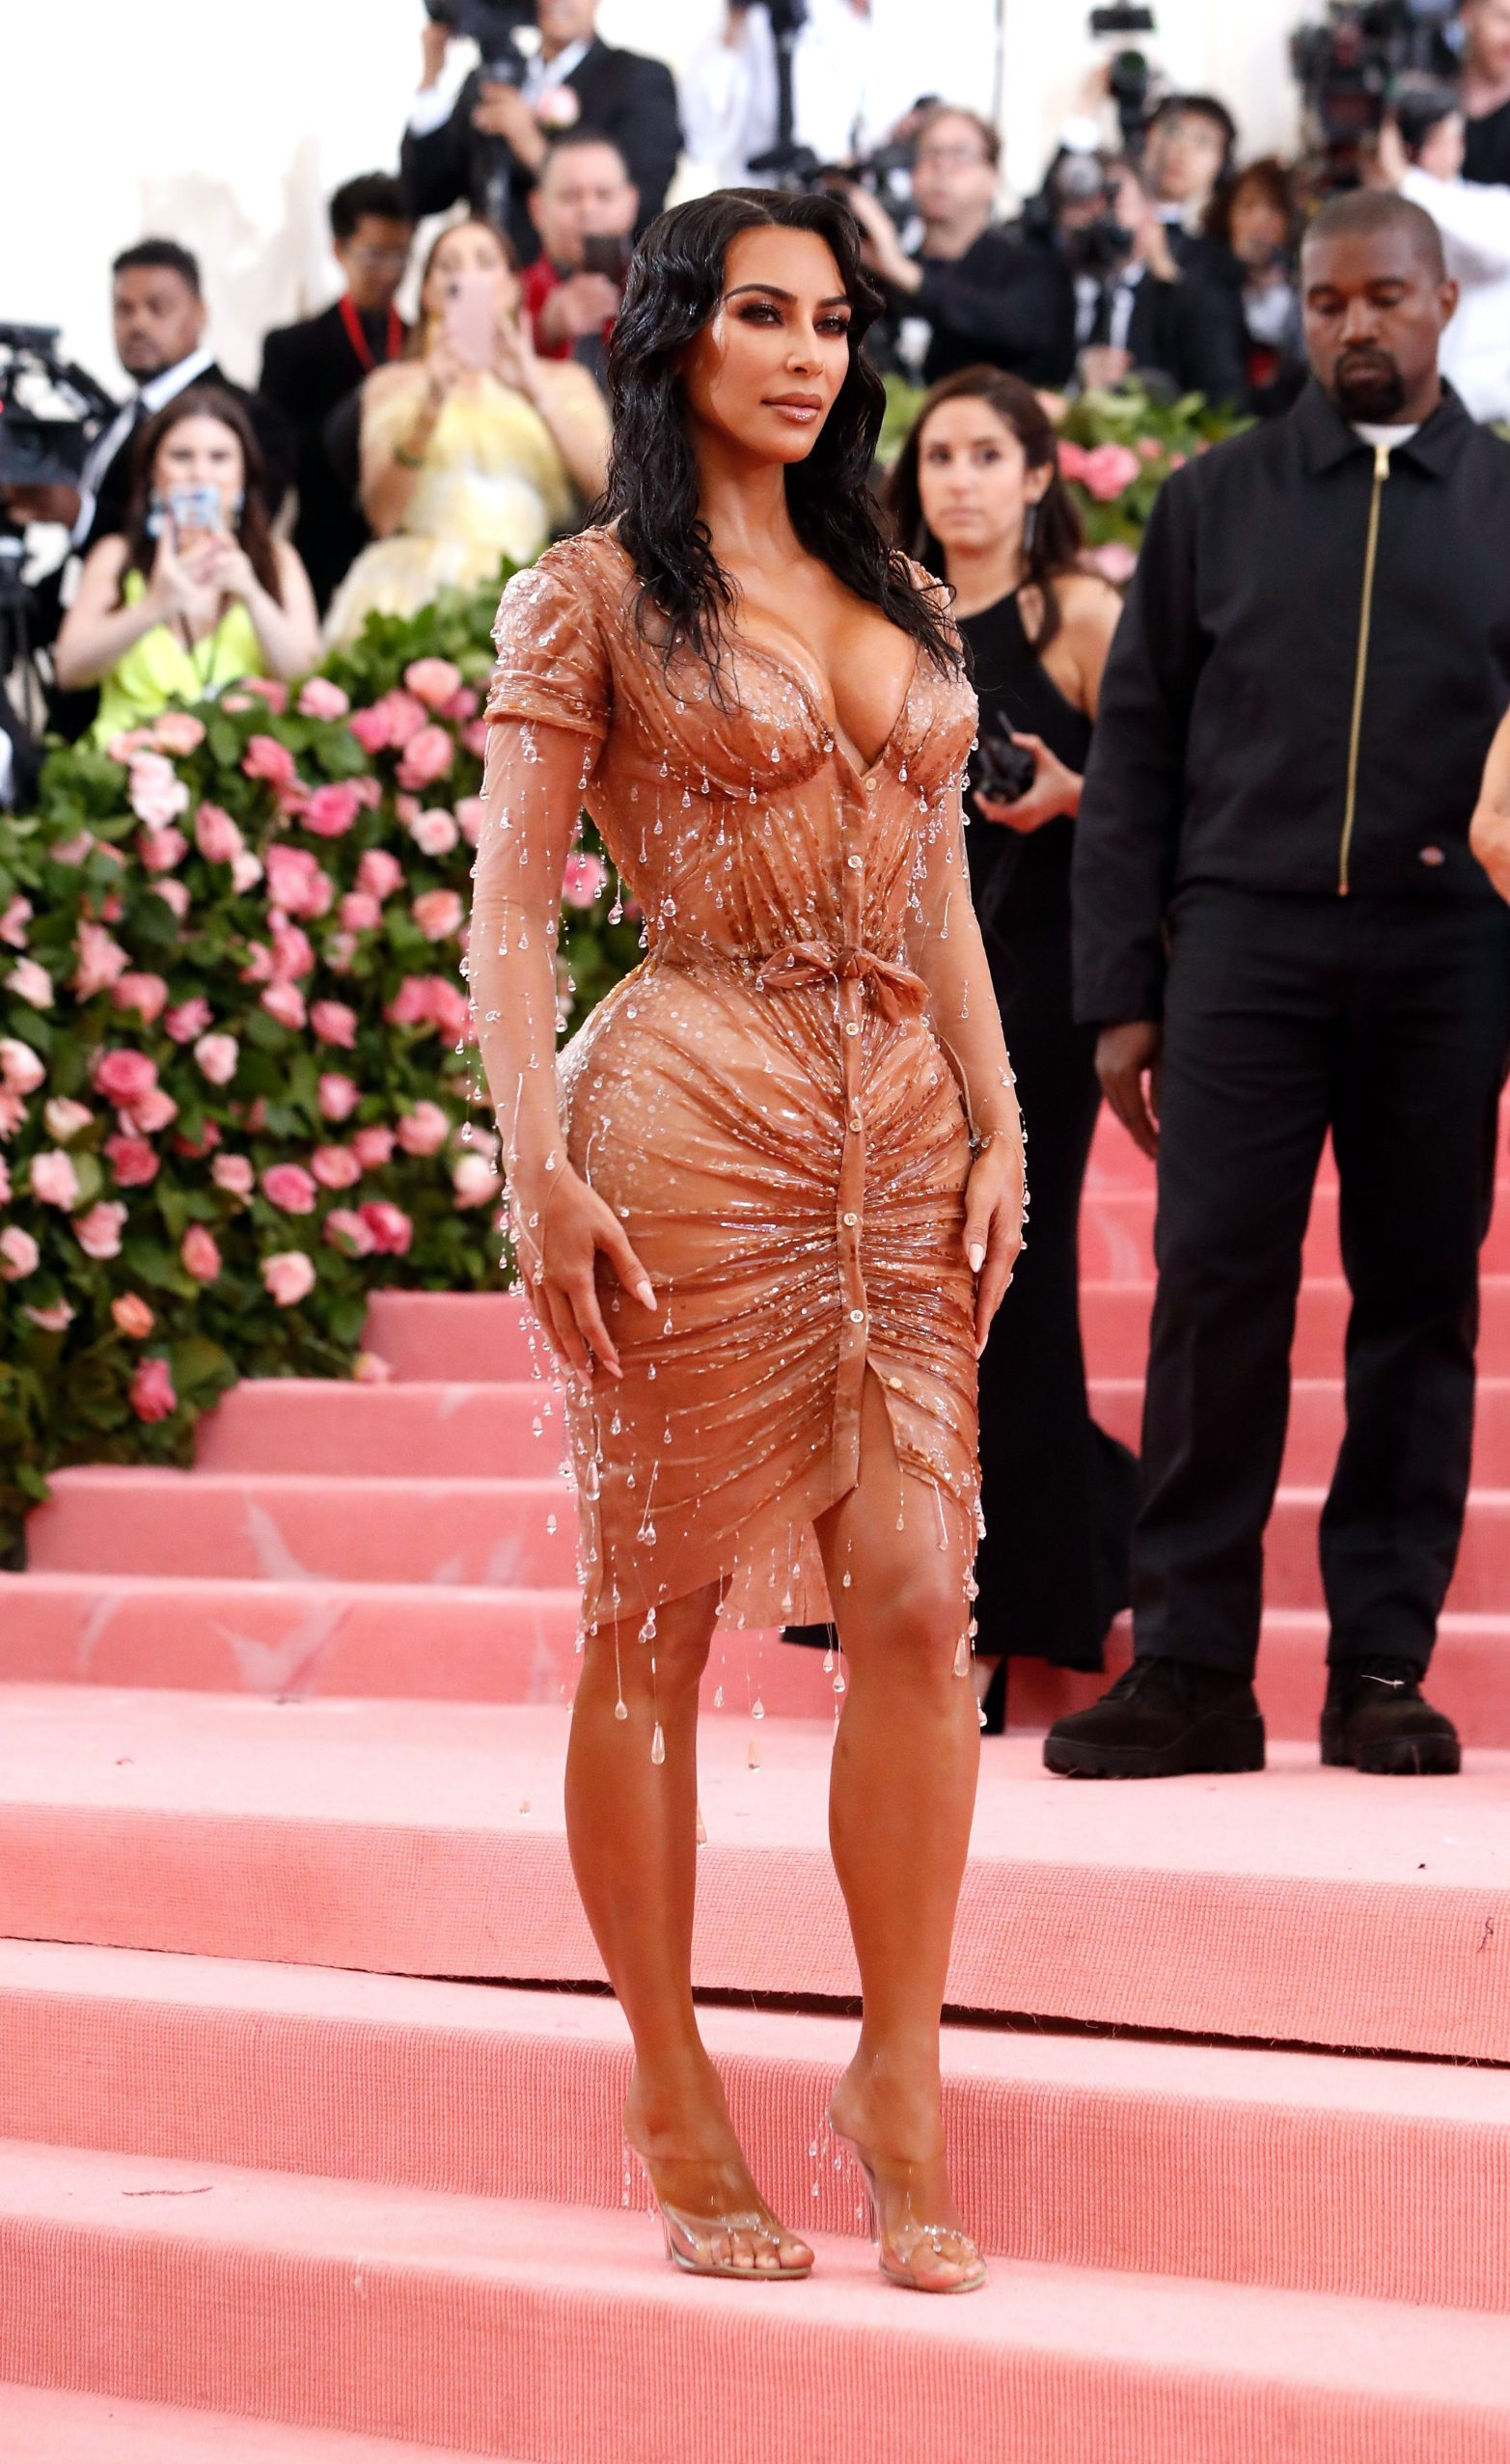 Metropolitan Museum of Art Costume Institute Gala - Met Gala - Camp: Notes on Fashion- Arrivals - New York City, U.S. Äi May 6, 2019 - Kim Kardashian. REUTERS/Andrew Kelly